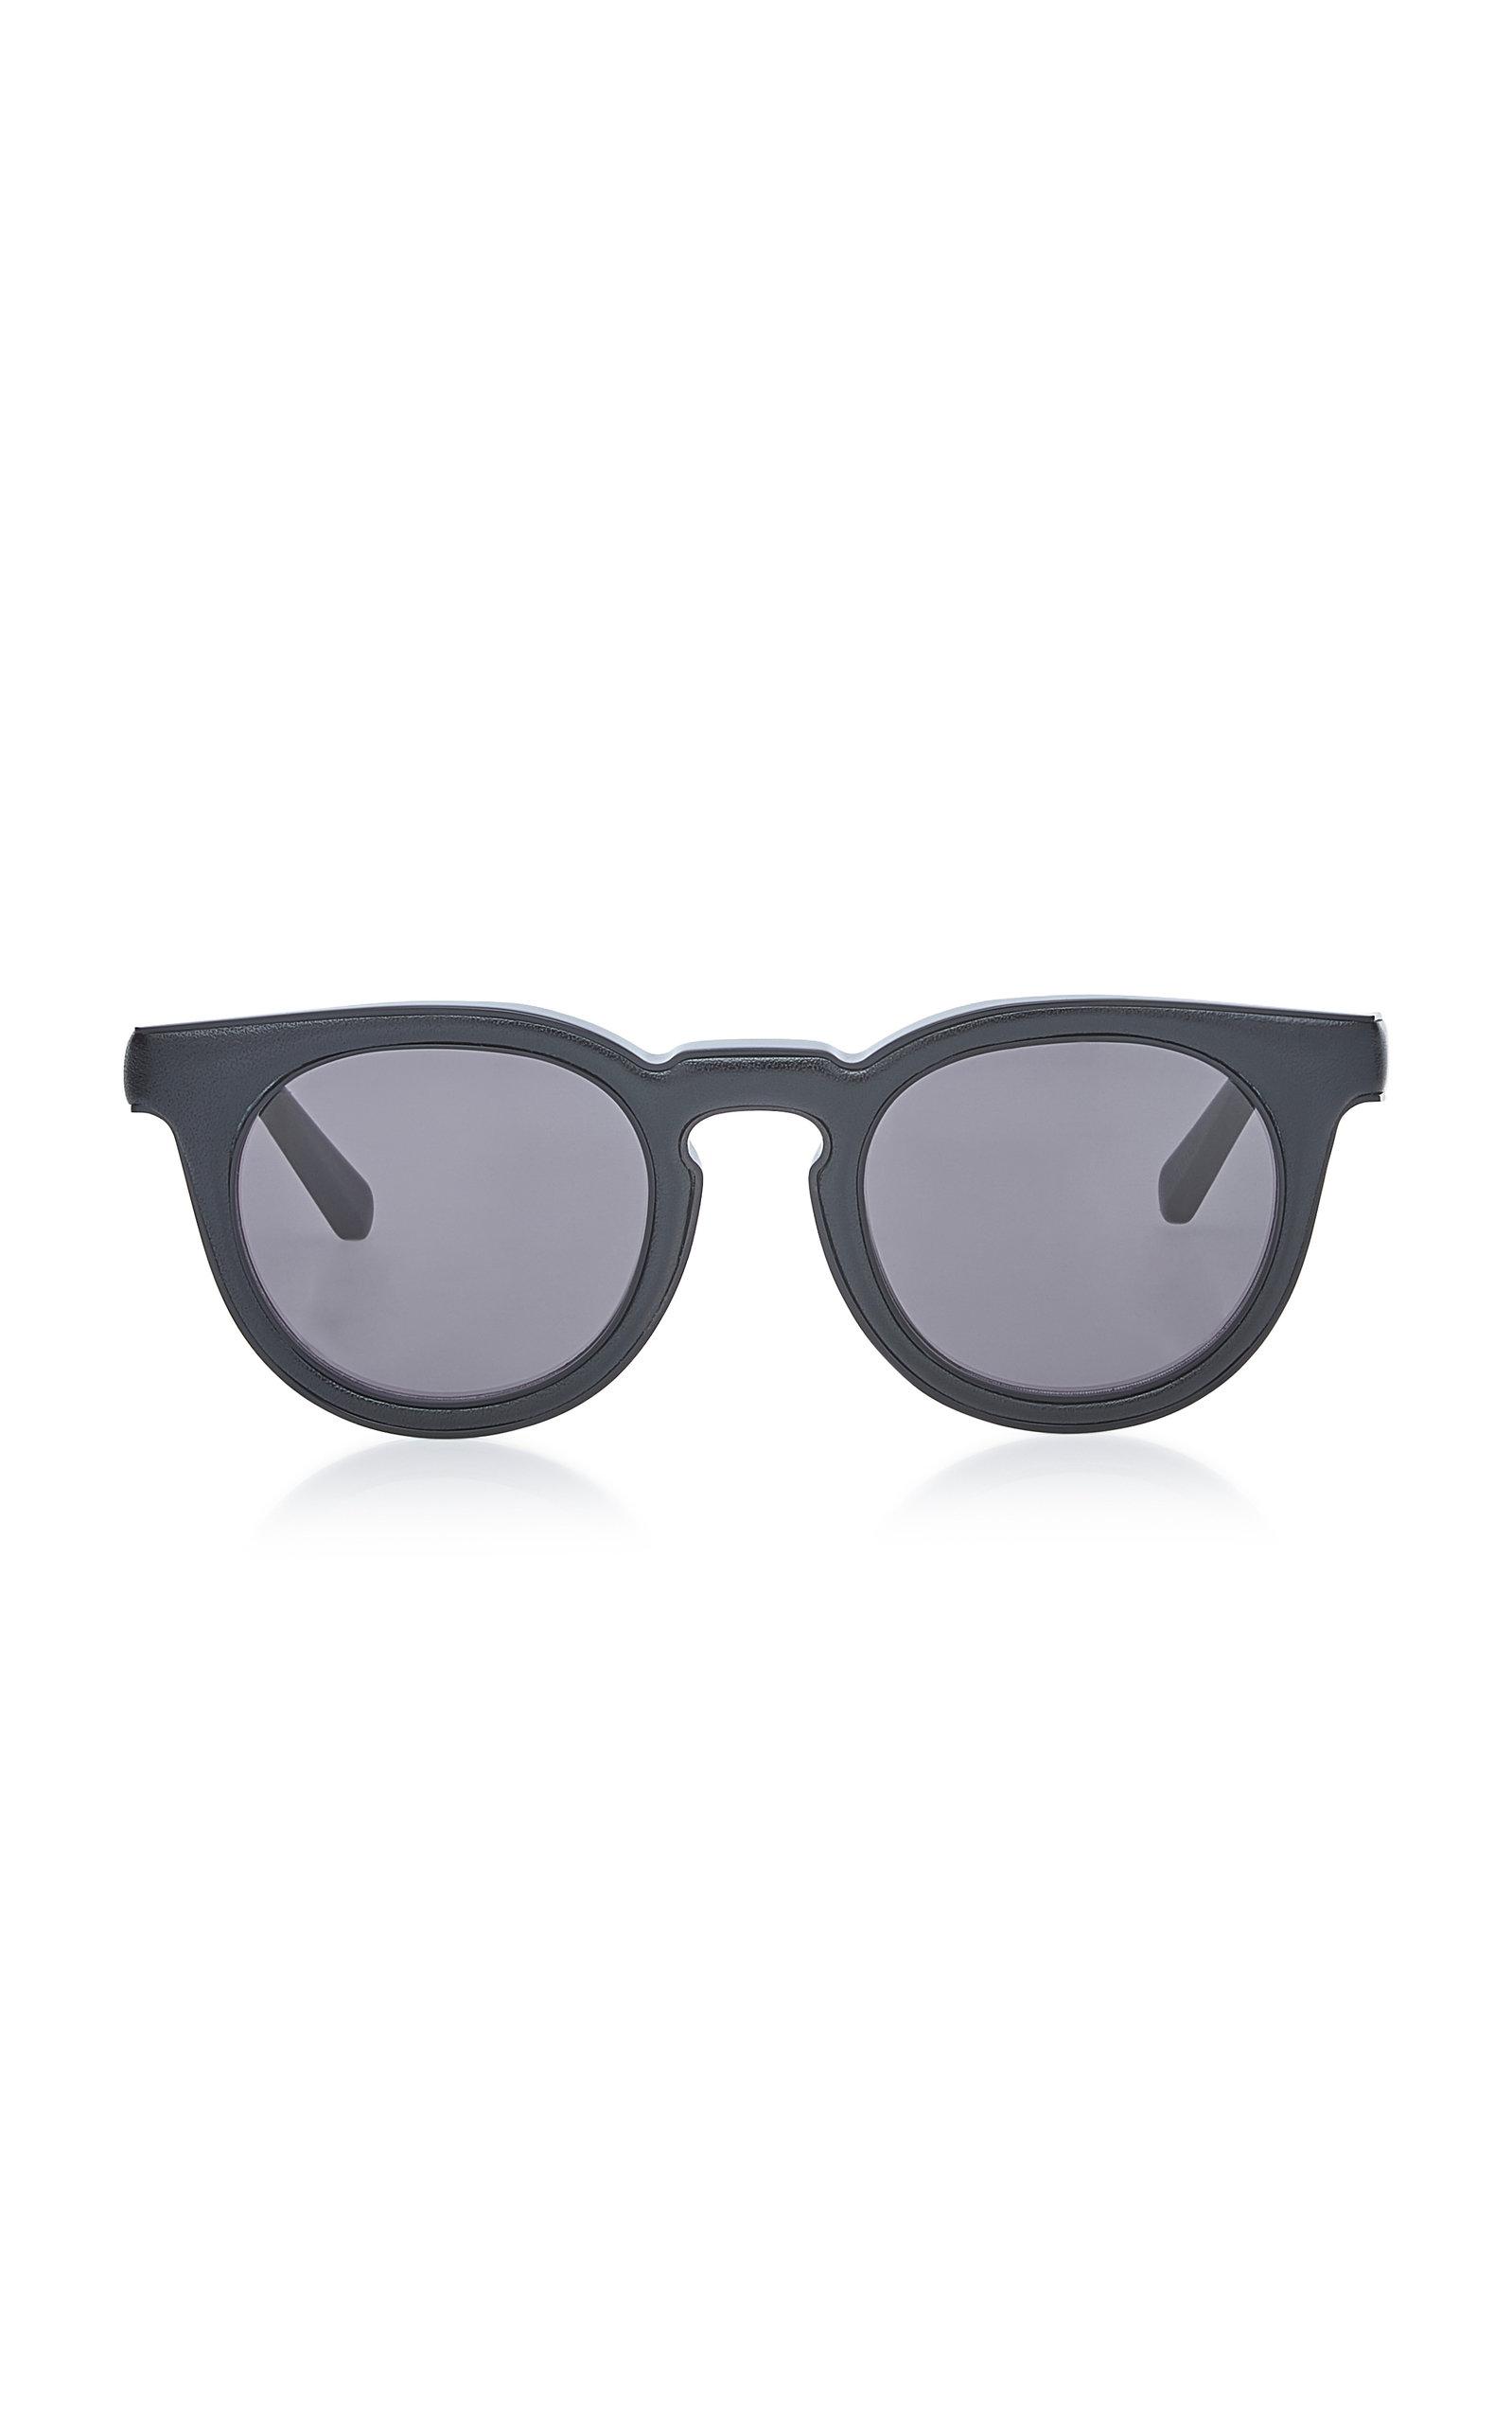 cc68d5540b Oversized Round Acetate Sunglasses